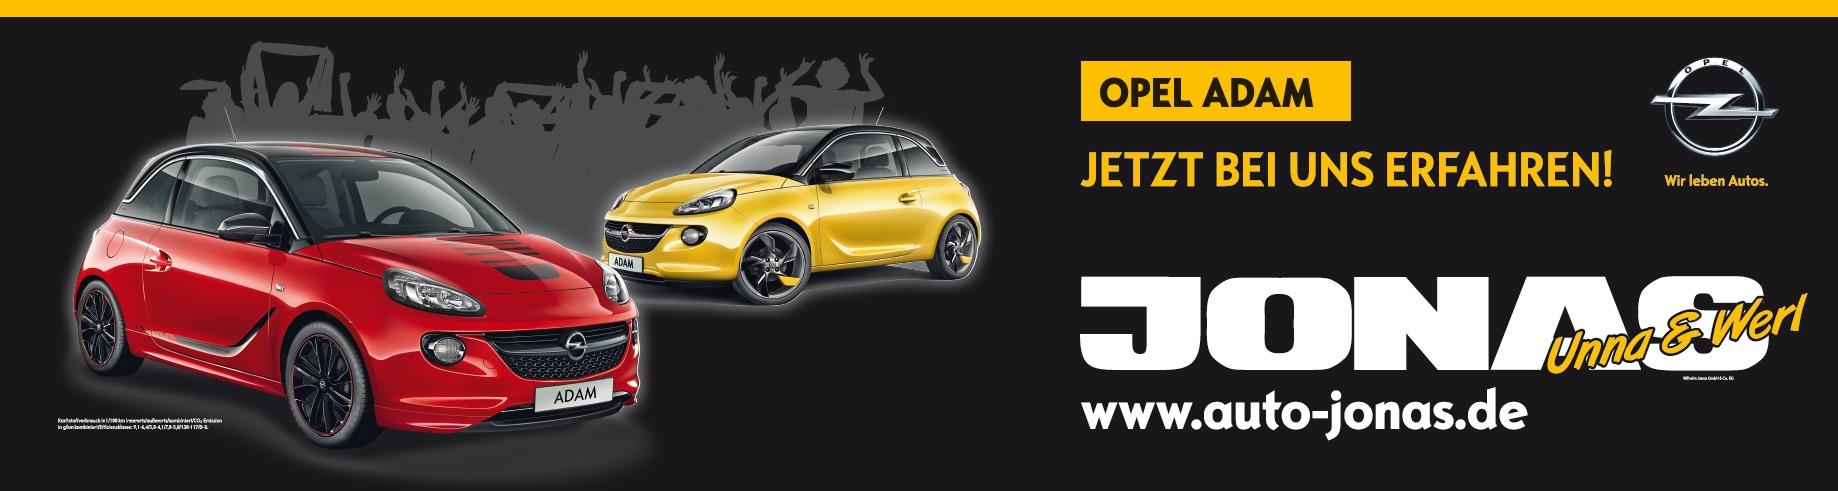 Opel Jonas_Adam